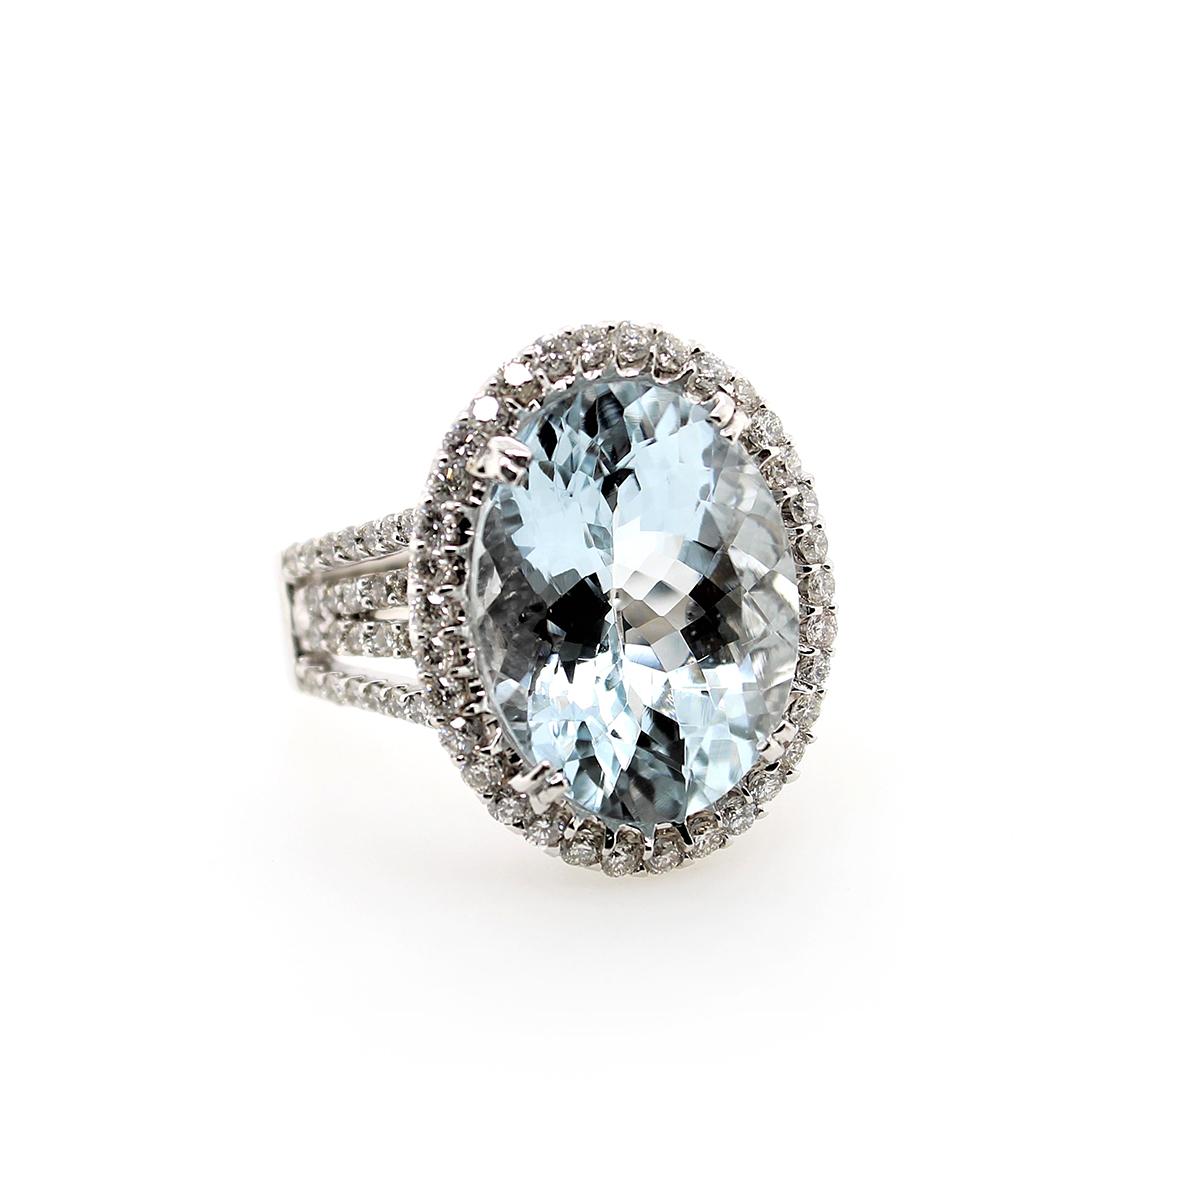 14 Karat White Gold Oval Aquamarine and Diamond Ring